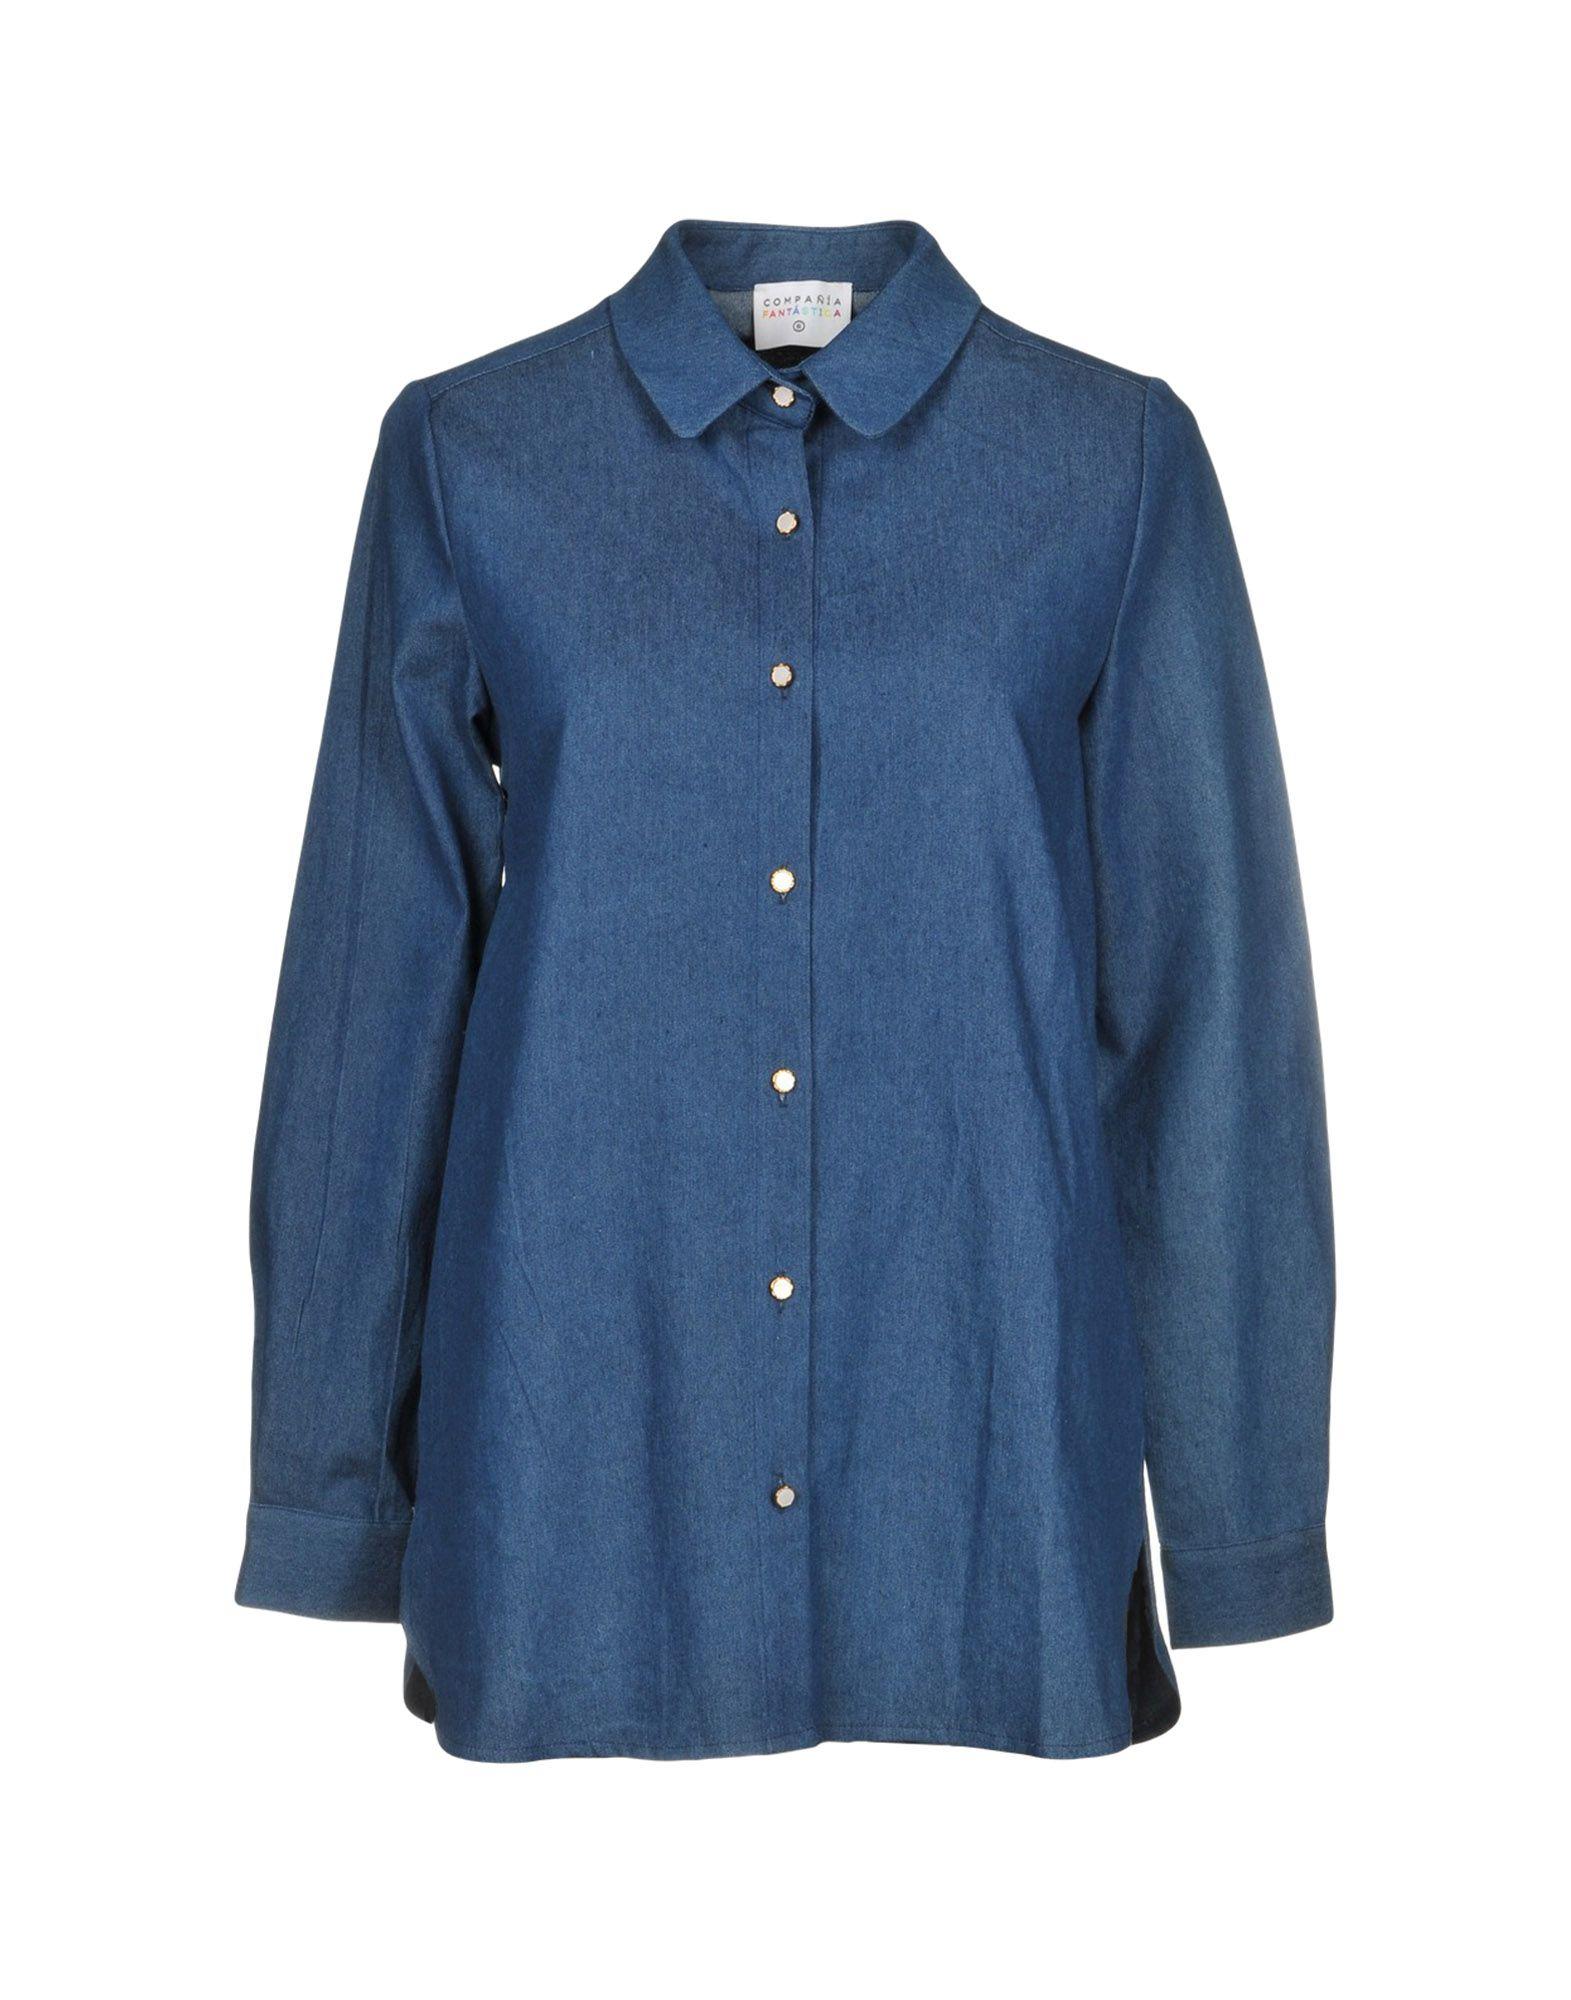 COMPAÑIA FANTASTICA Джинсовая рубашка pepe jeans gable stitching